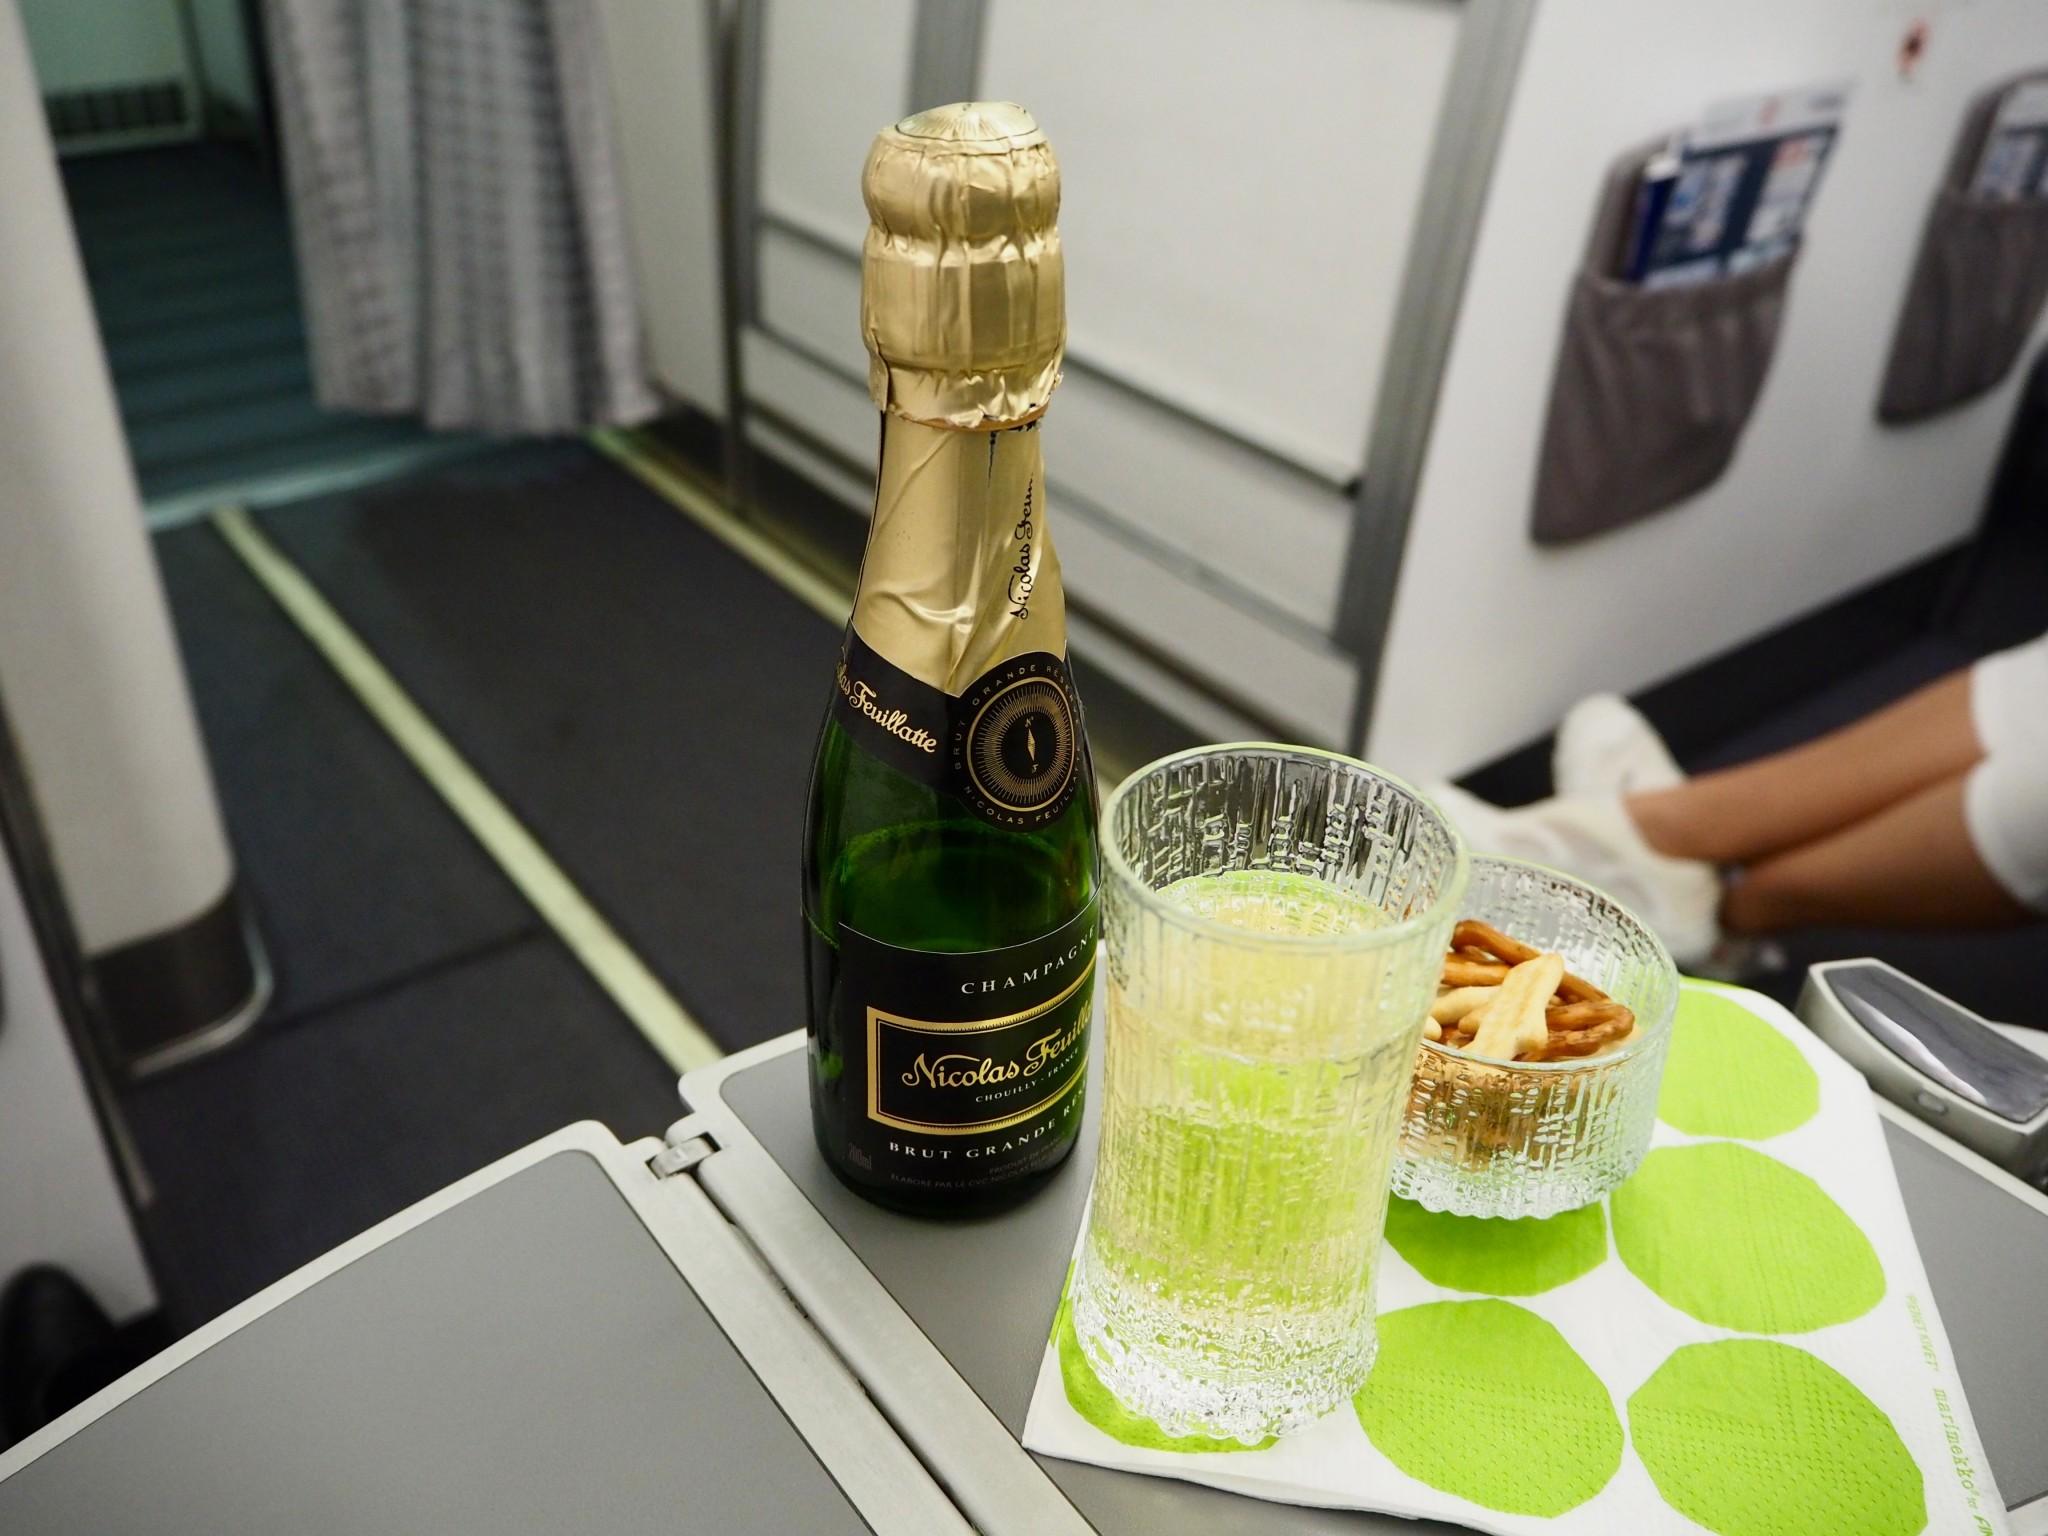 Finnair/Norra businessluokka